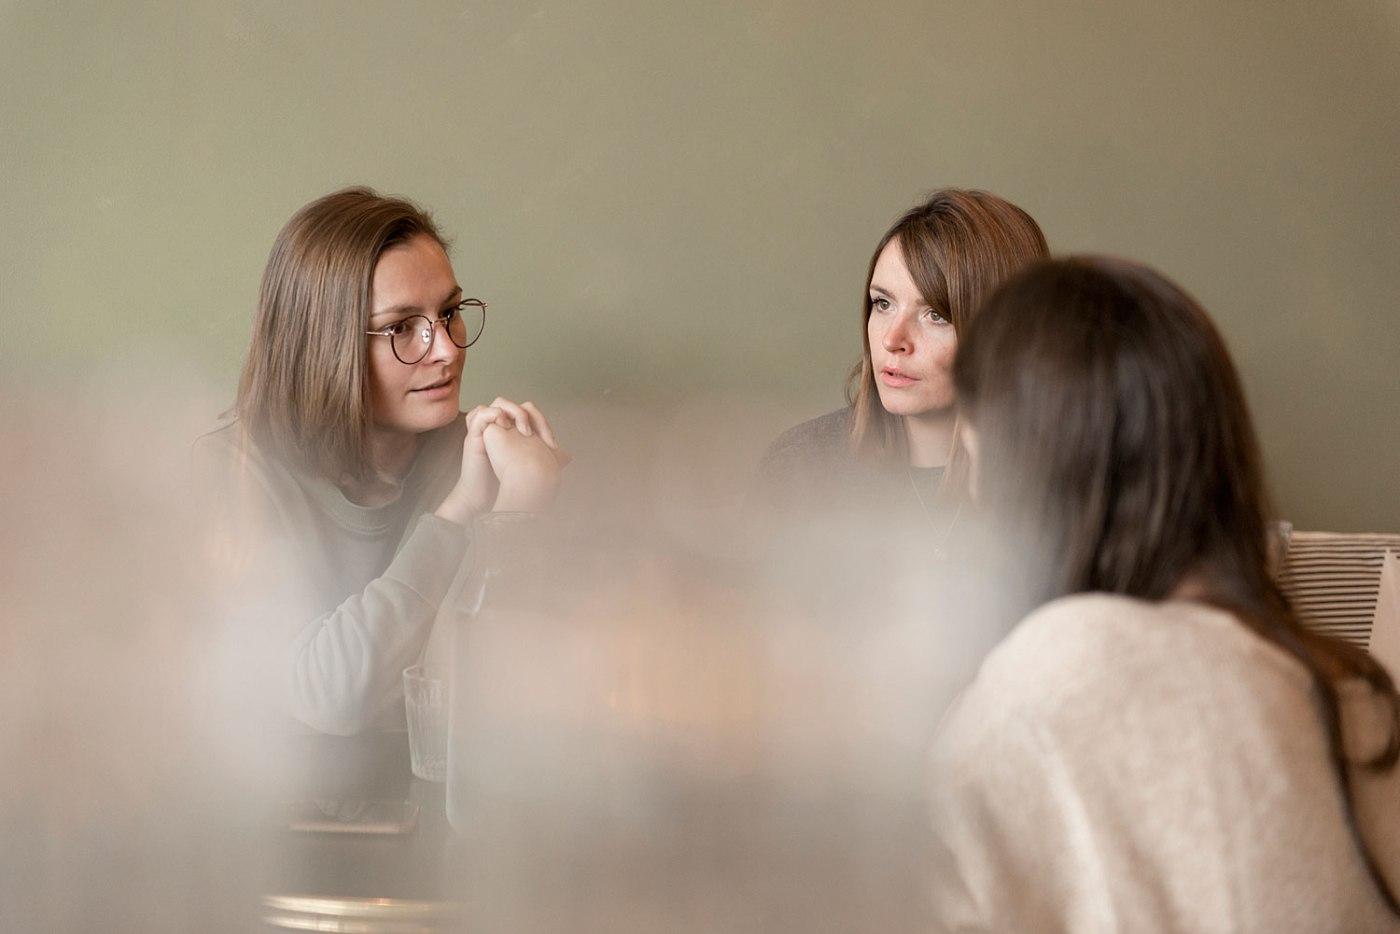 fanny-tourme-clarisse-guiho-etonnantes-solenn-cosotti-remy-lidereau-kinfolk-coffee-shop-interview